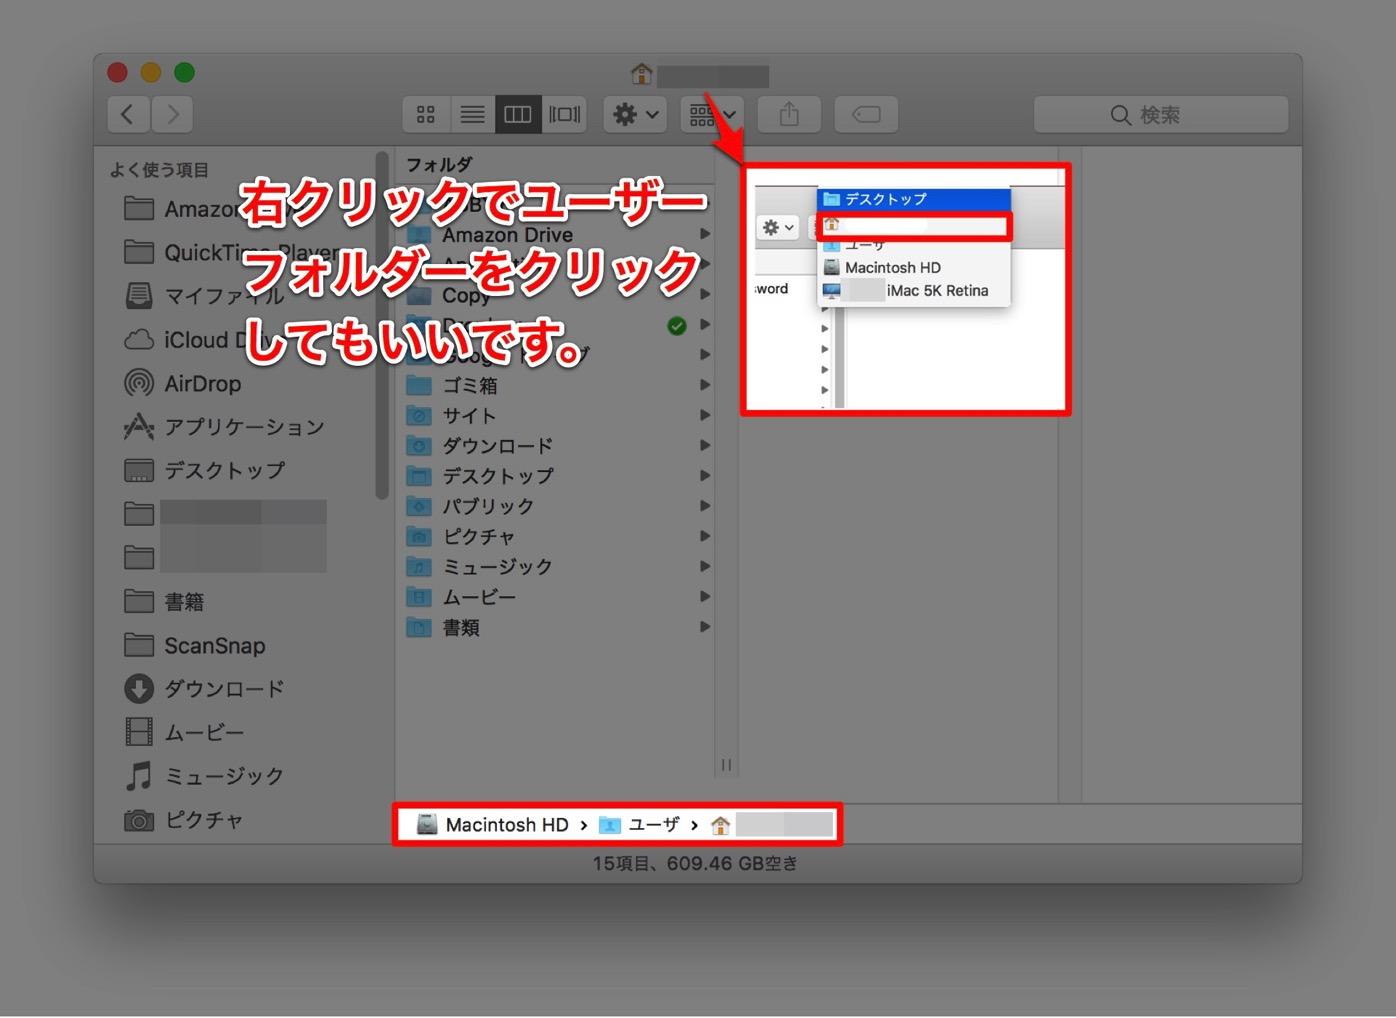 AppleStore-7